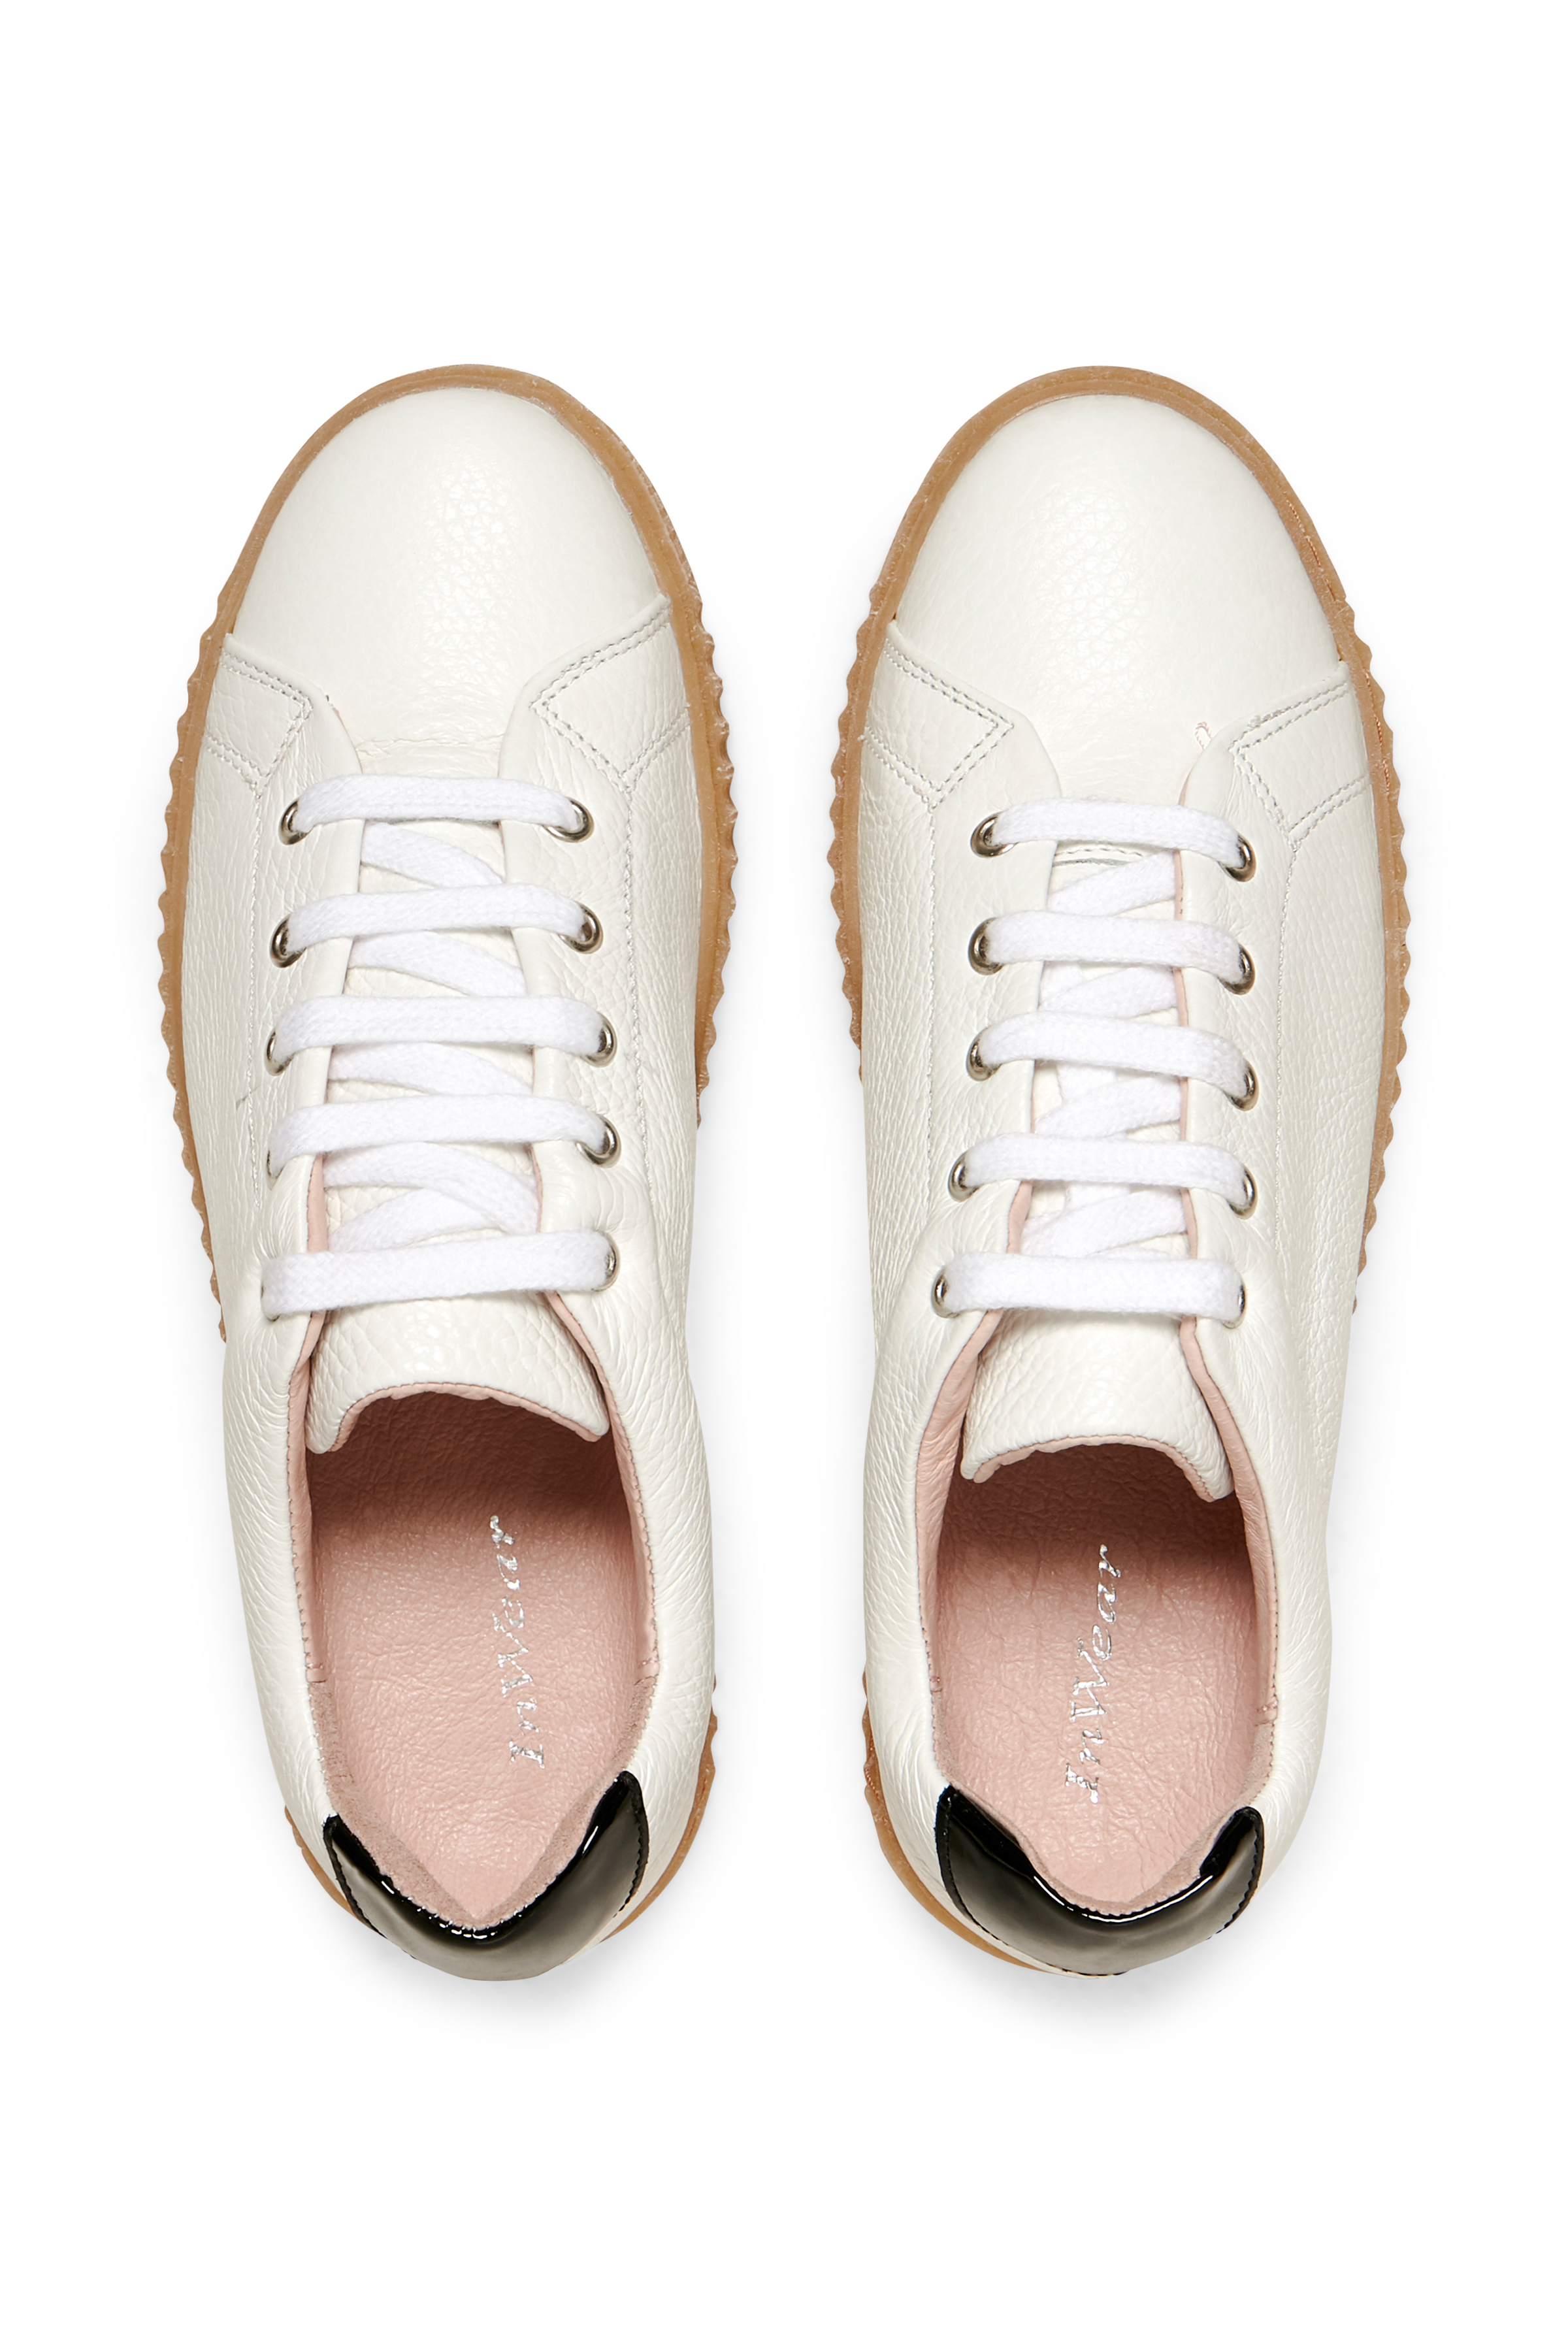 Pure White Sko – Køb Pure White Sko fra str. 36-41 her